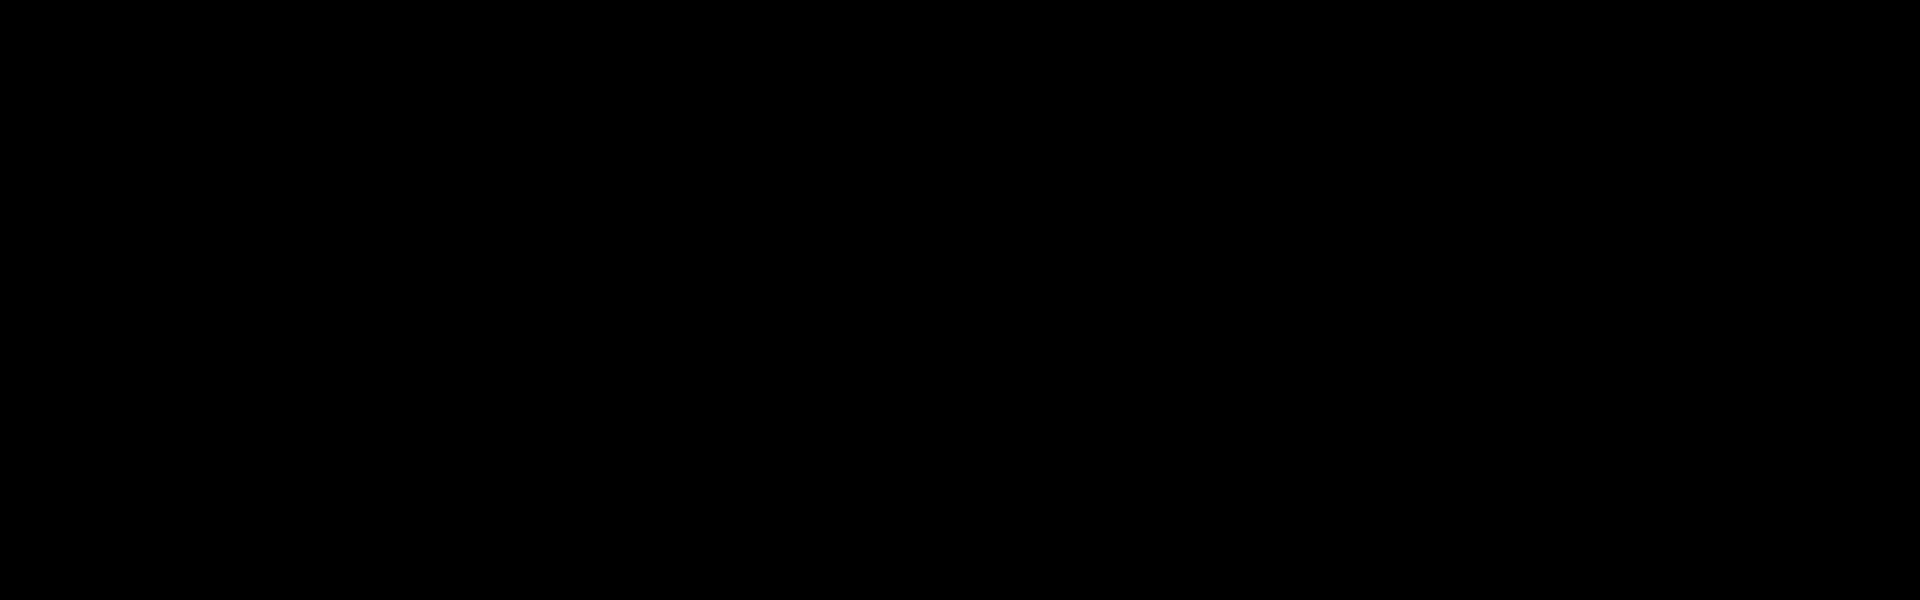 Jonsplus